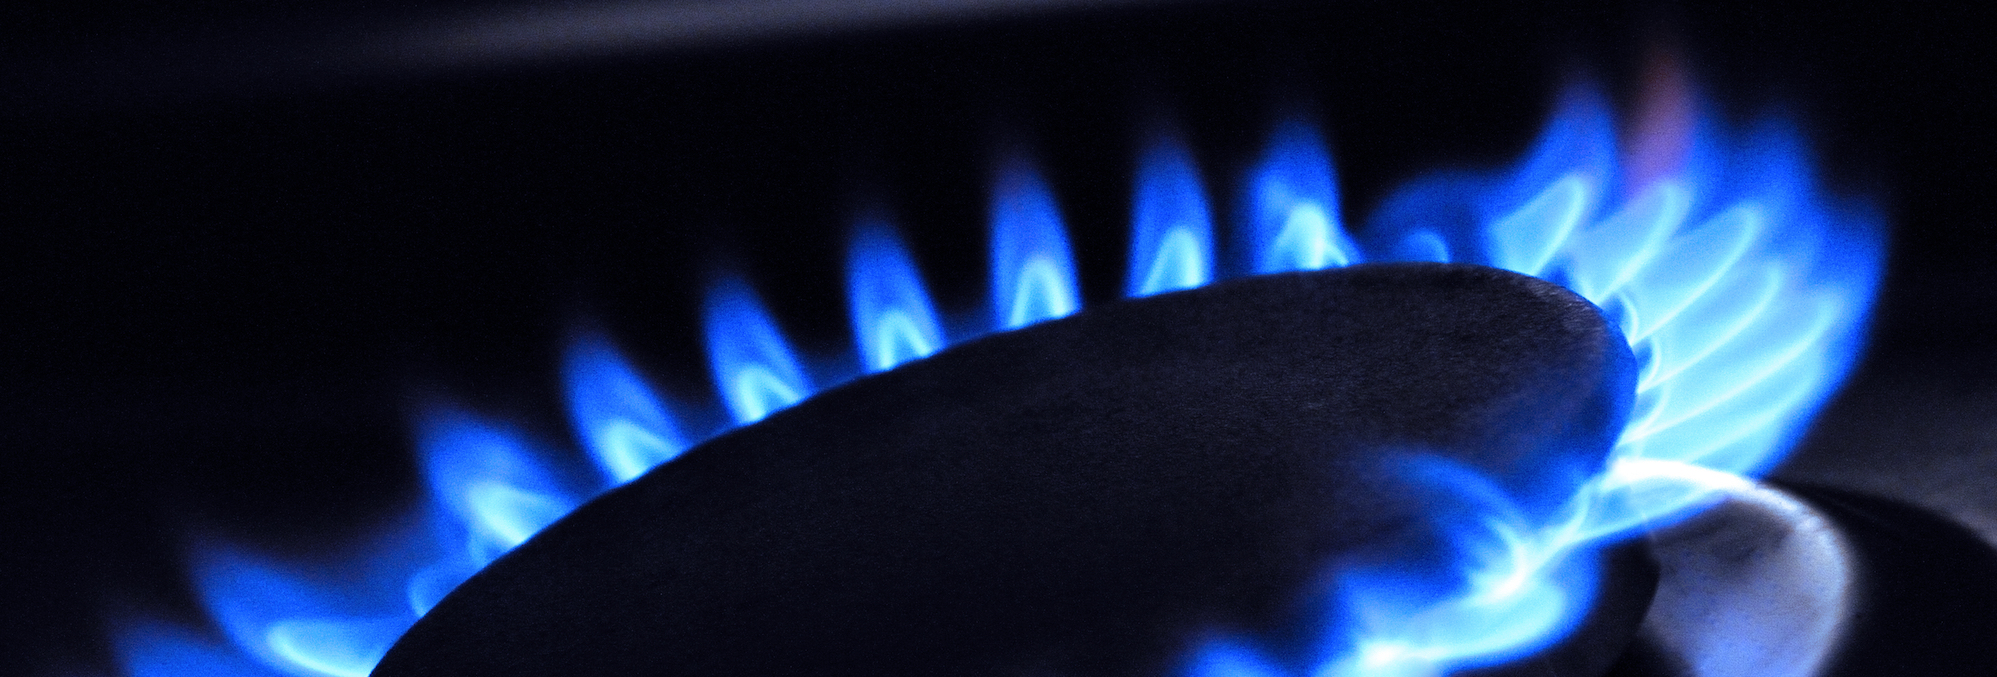 British Gas image